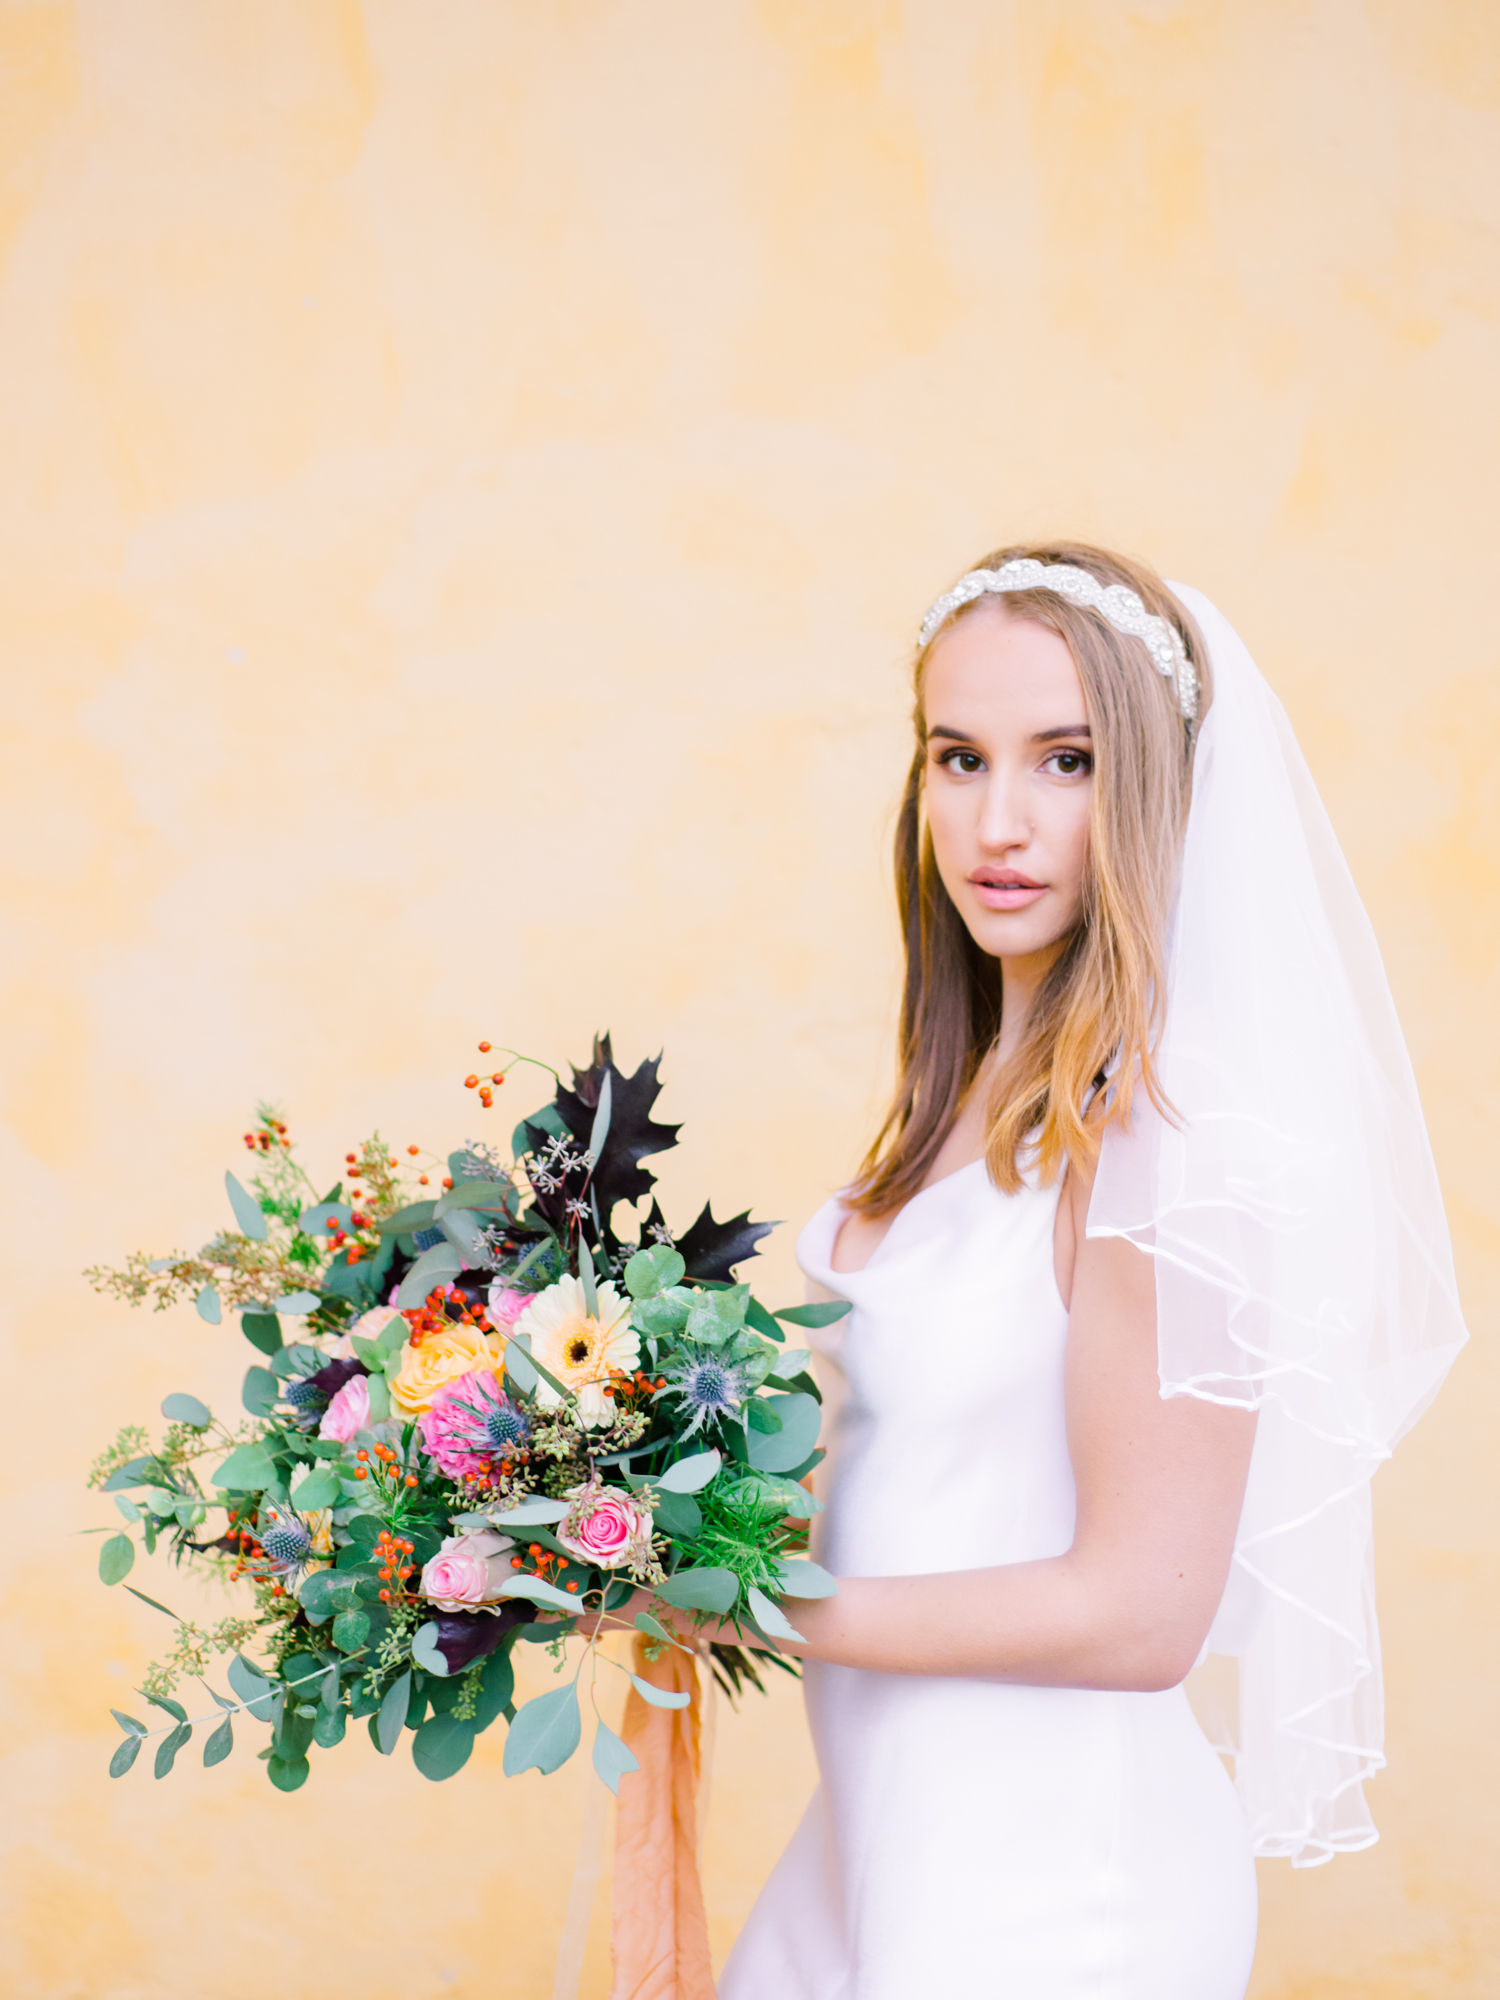 Elegant Organic Fall Swedish Bridal Wedding Styled Shoot - Erika Alvarenga Photography-114.jpg